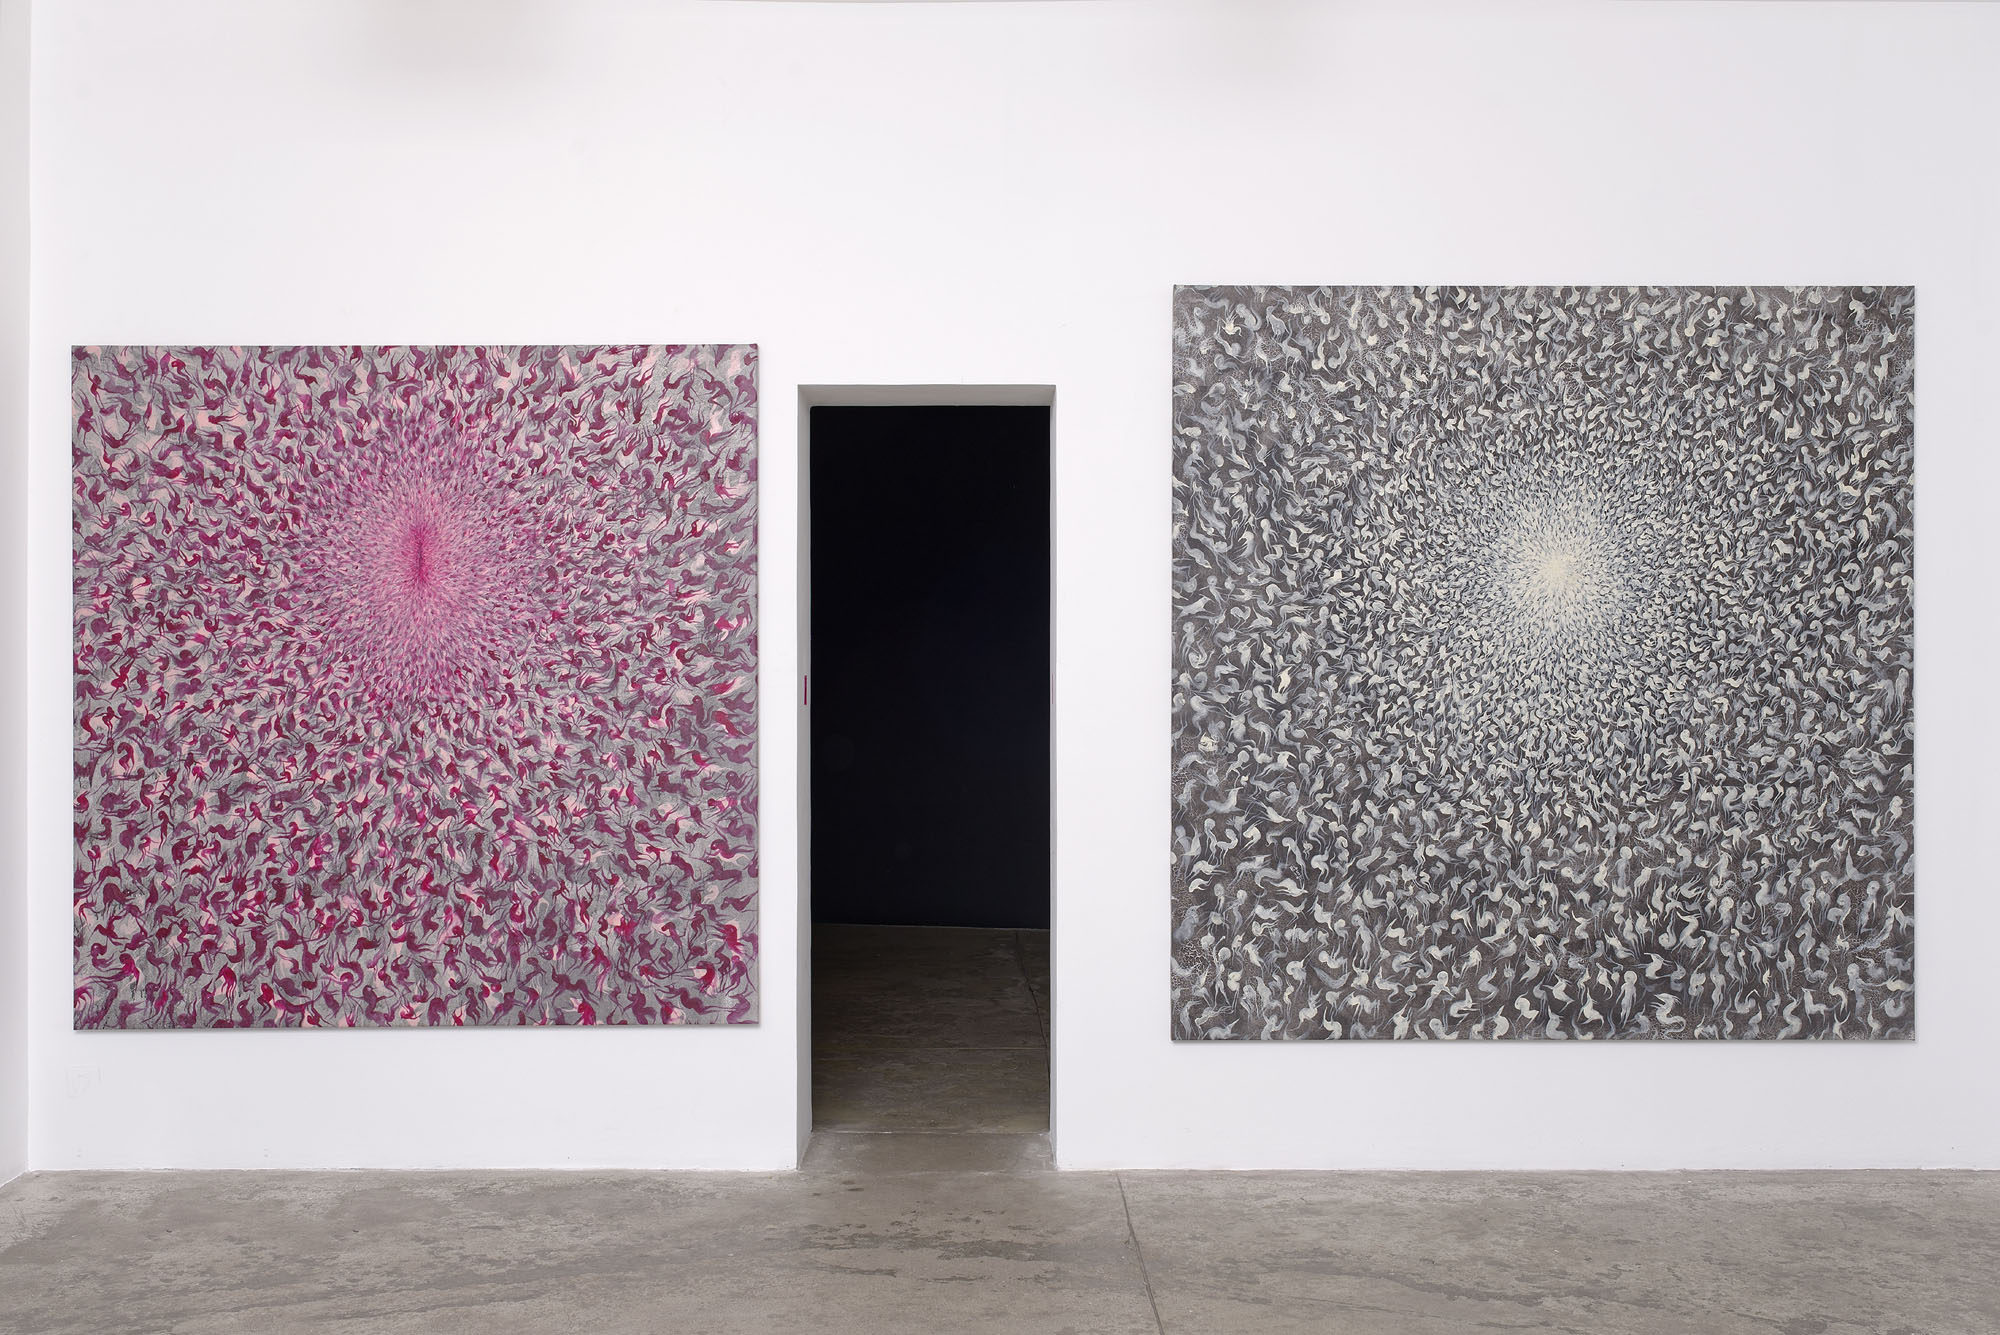 Babak Alebrahim Dehkordi — Galerie Georges-Philippe & Nathalie Vallois